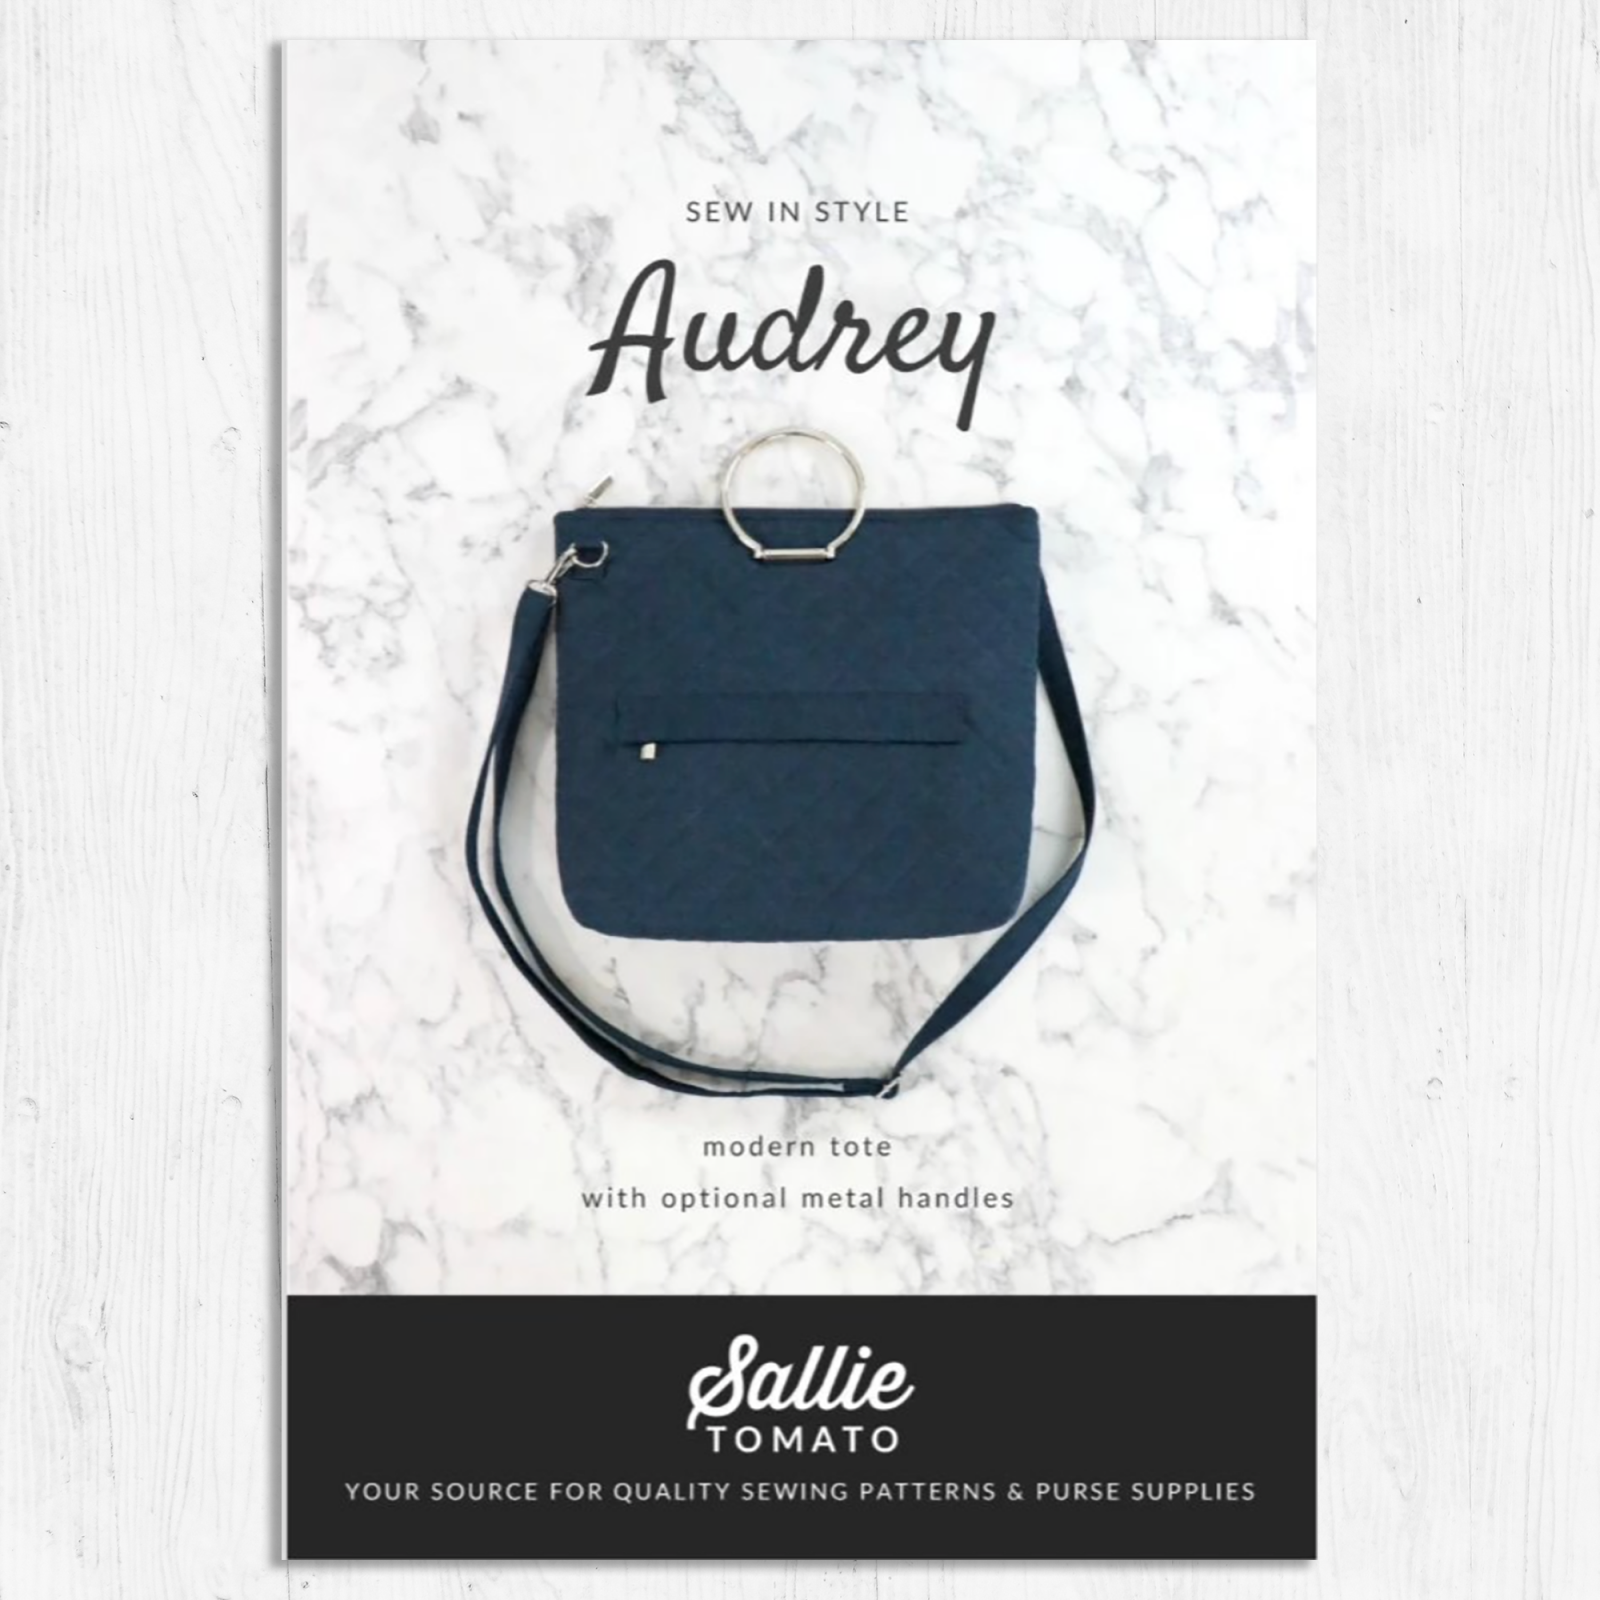 Sallie Tomato - Audrey Bag Pattern